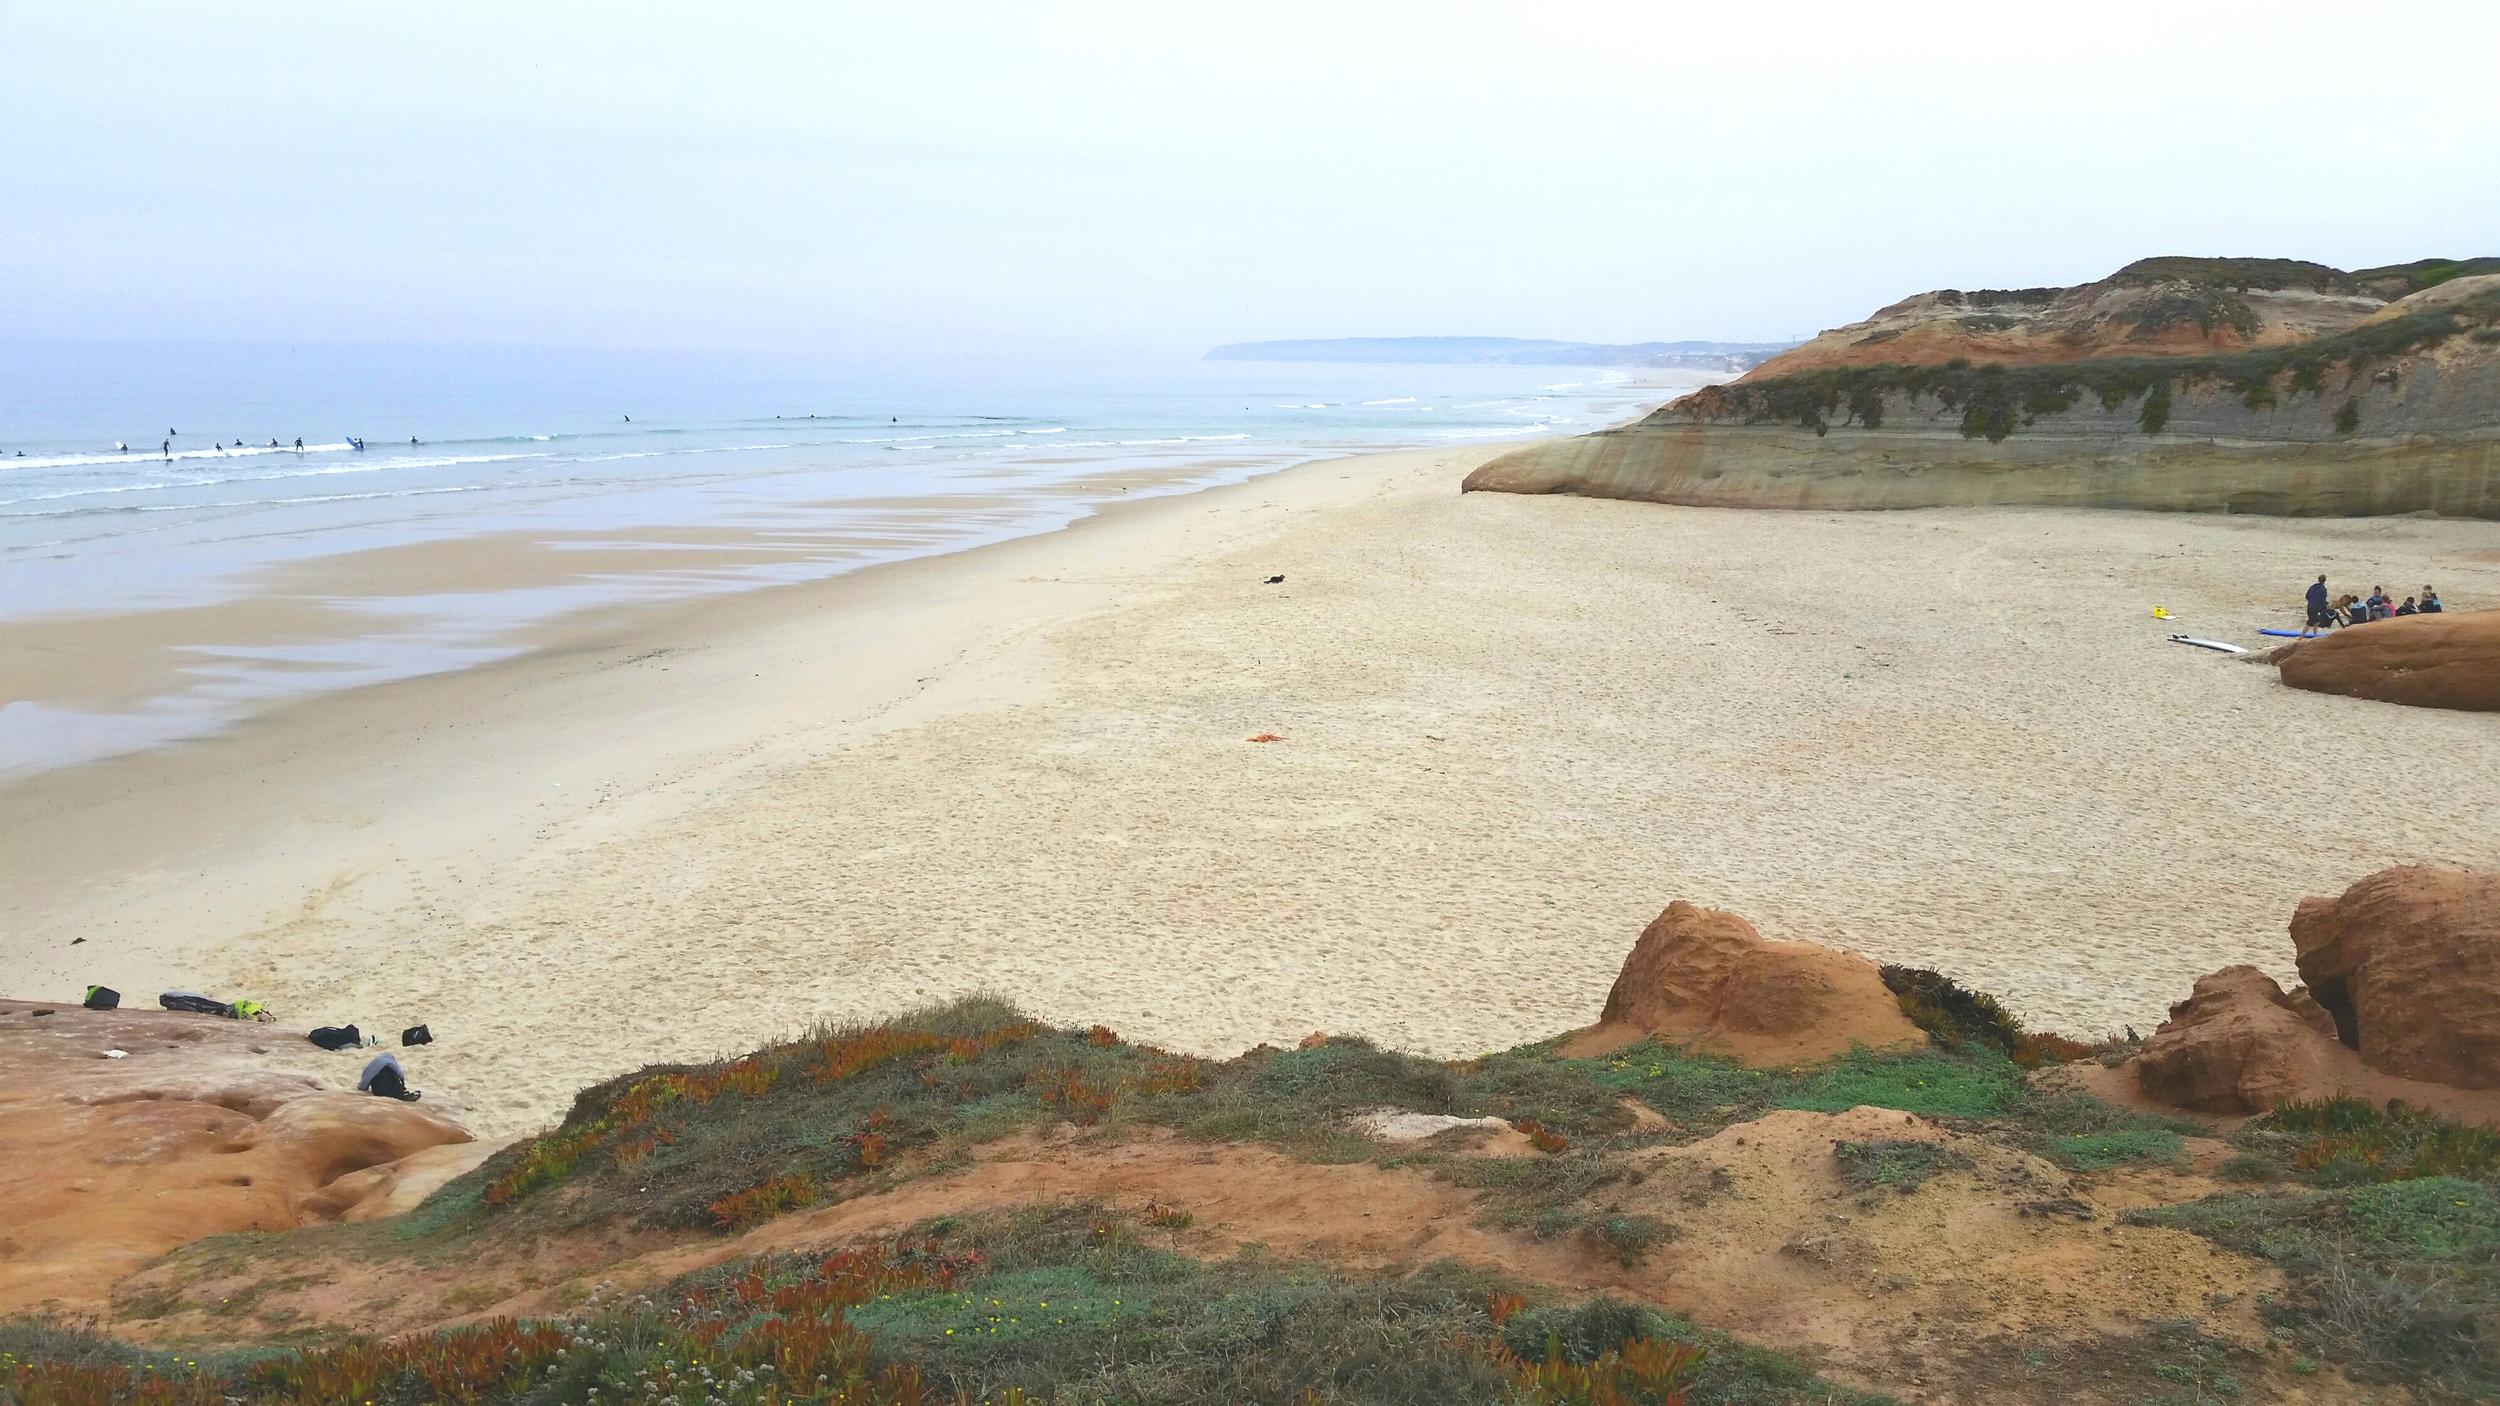 portugal beach photoshopped.jpg